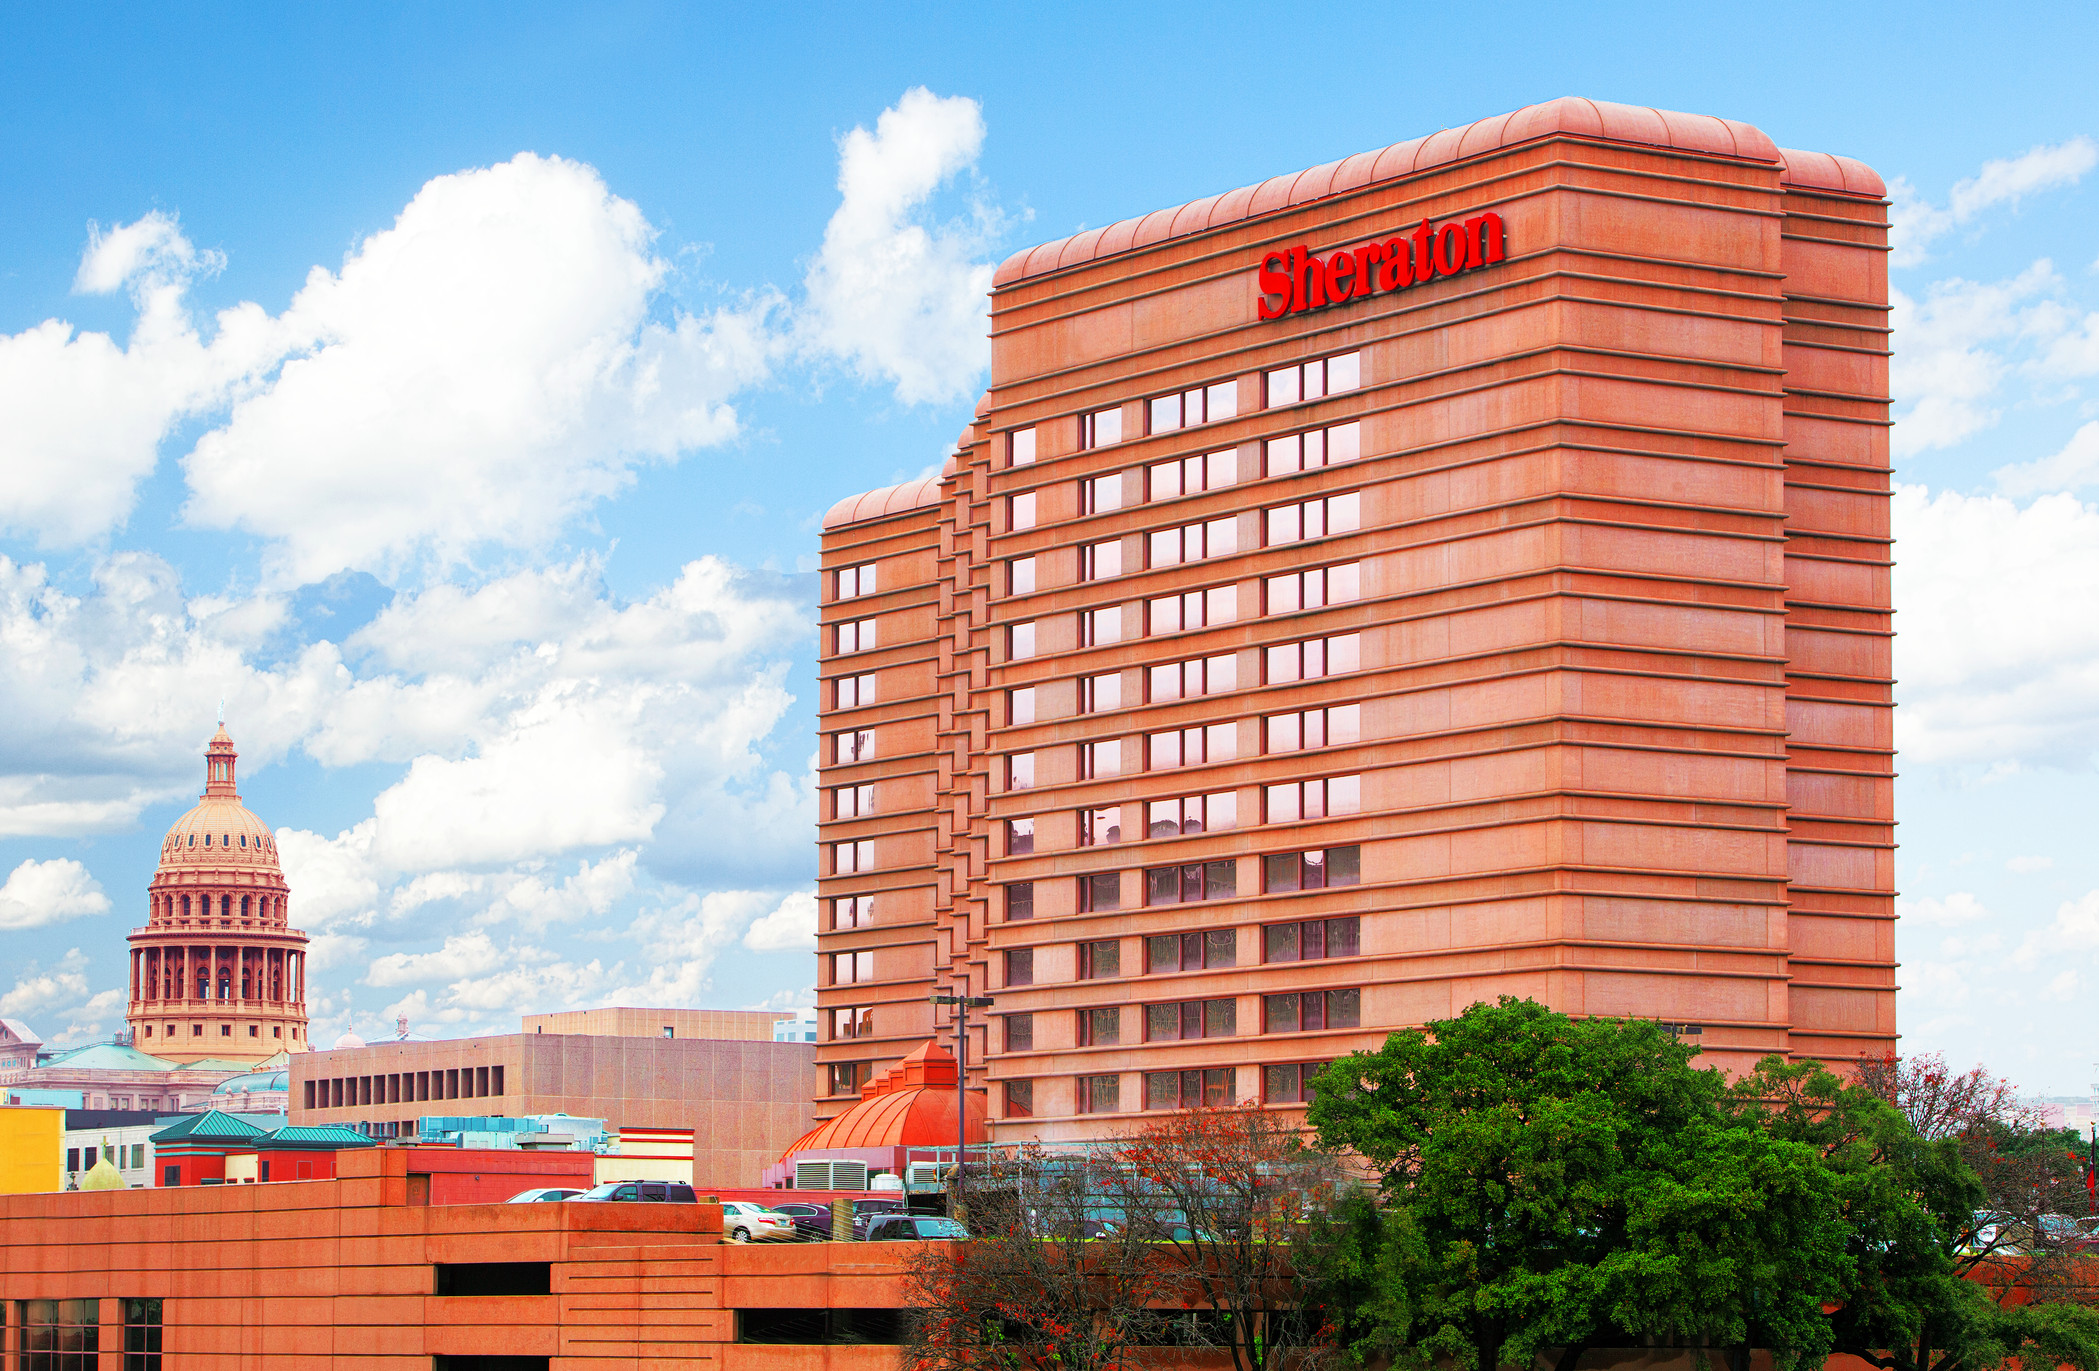 Sheraton Austin Hotel for TechForward Event